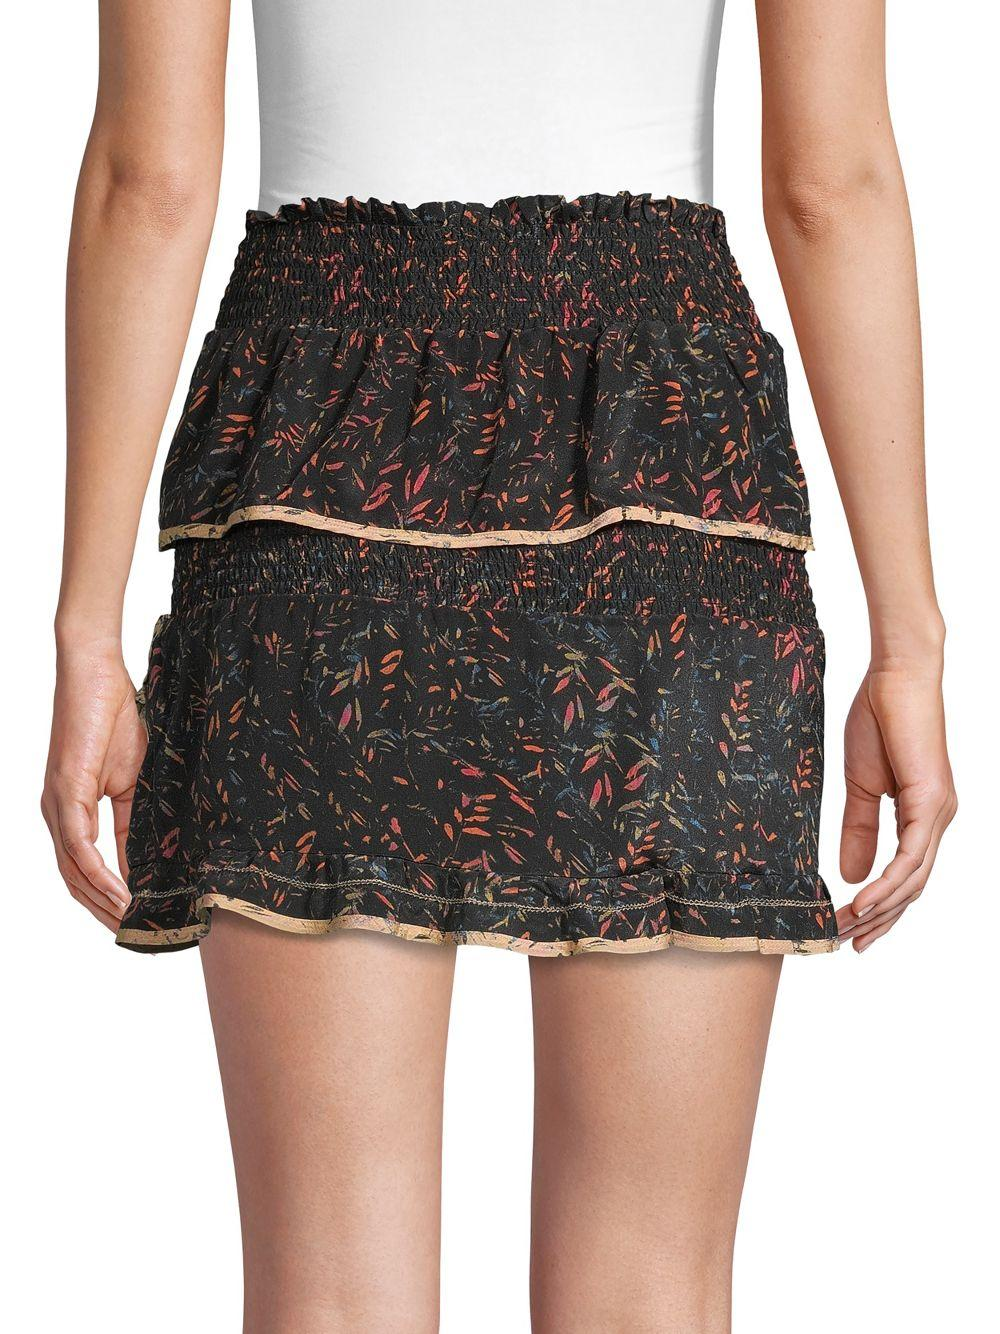 22331708454e8 IRO Jully Tiered Ruffle Mini Skirt in Black - Lyst